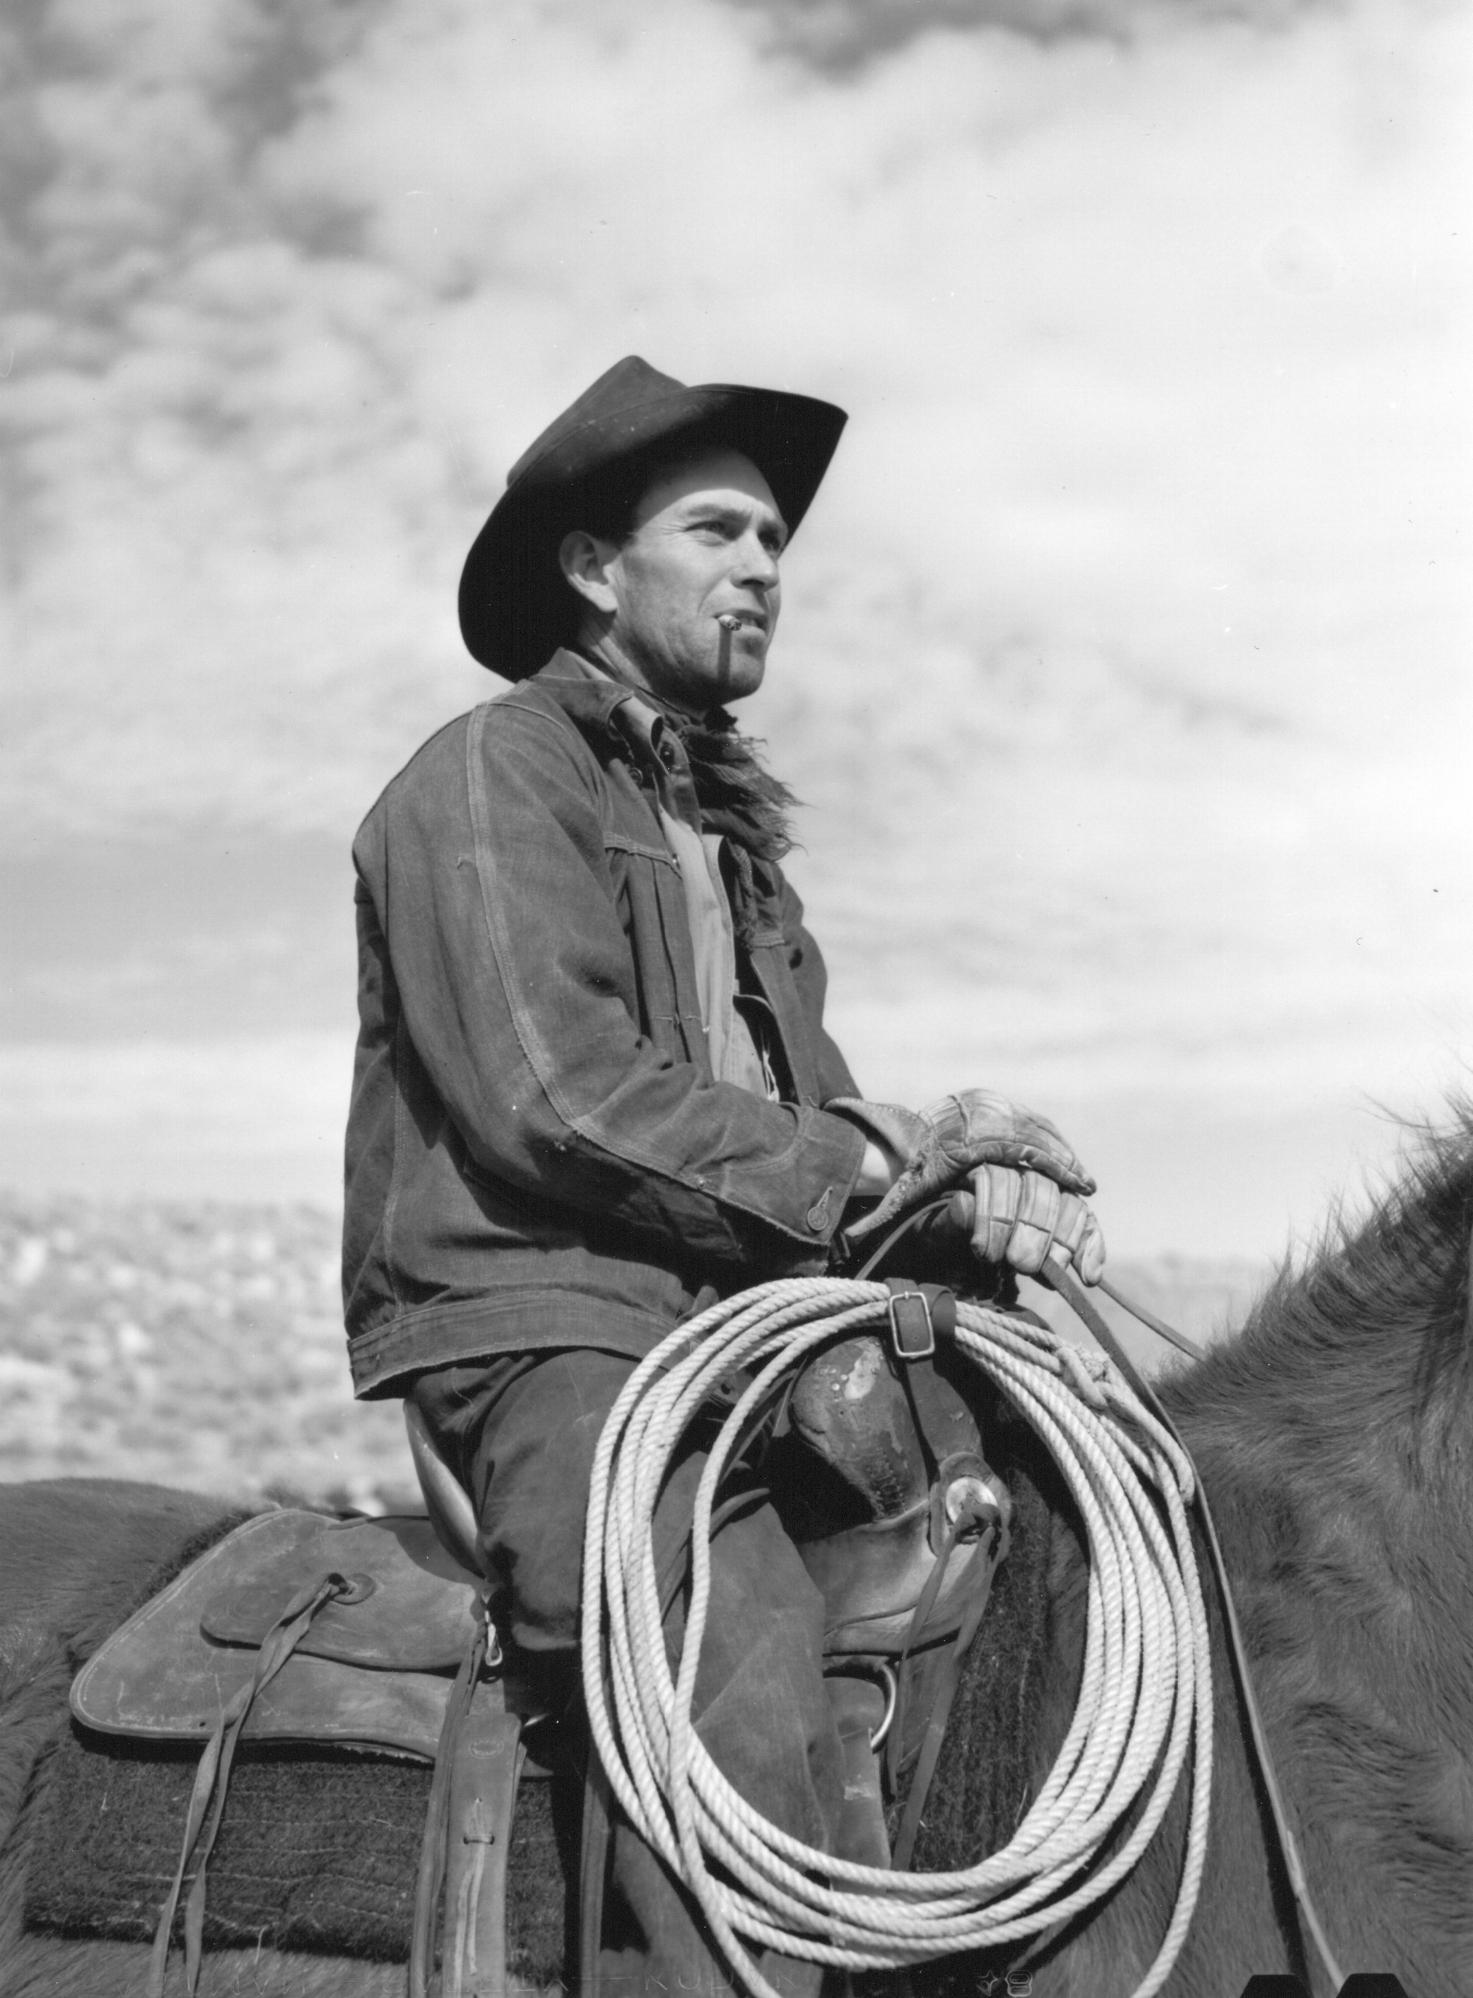 Cowhand. Elko County, Nevada. Arthur Rothstein, March 1940.